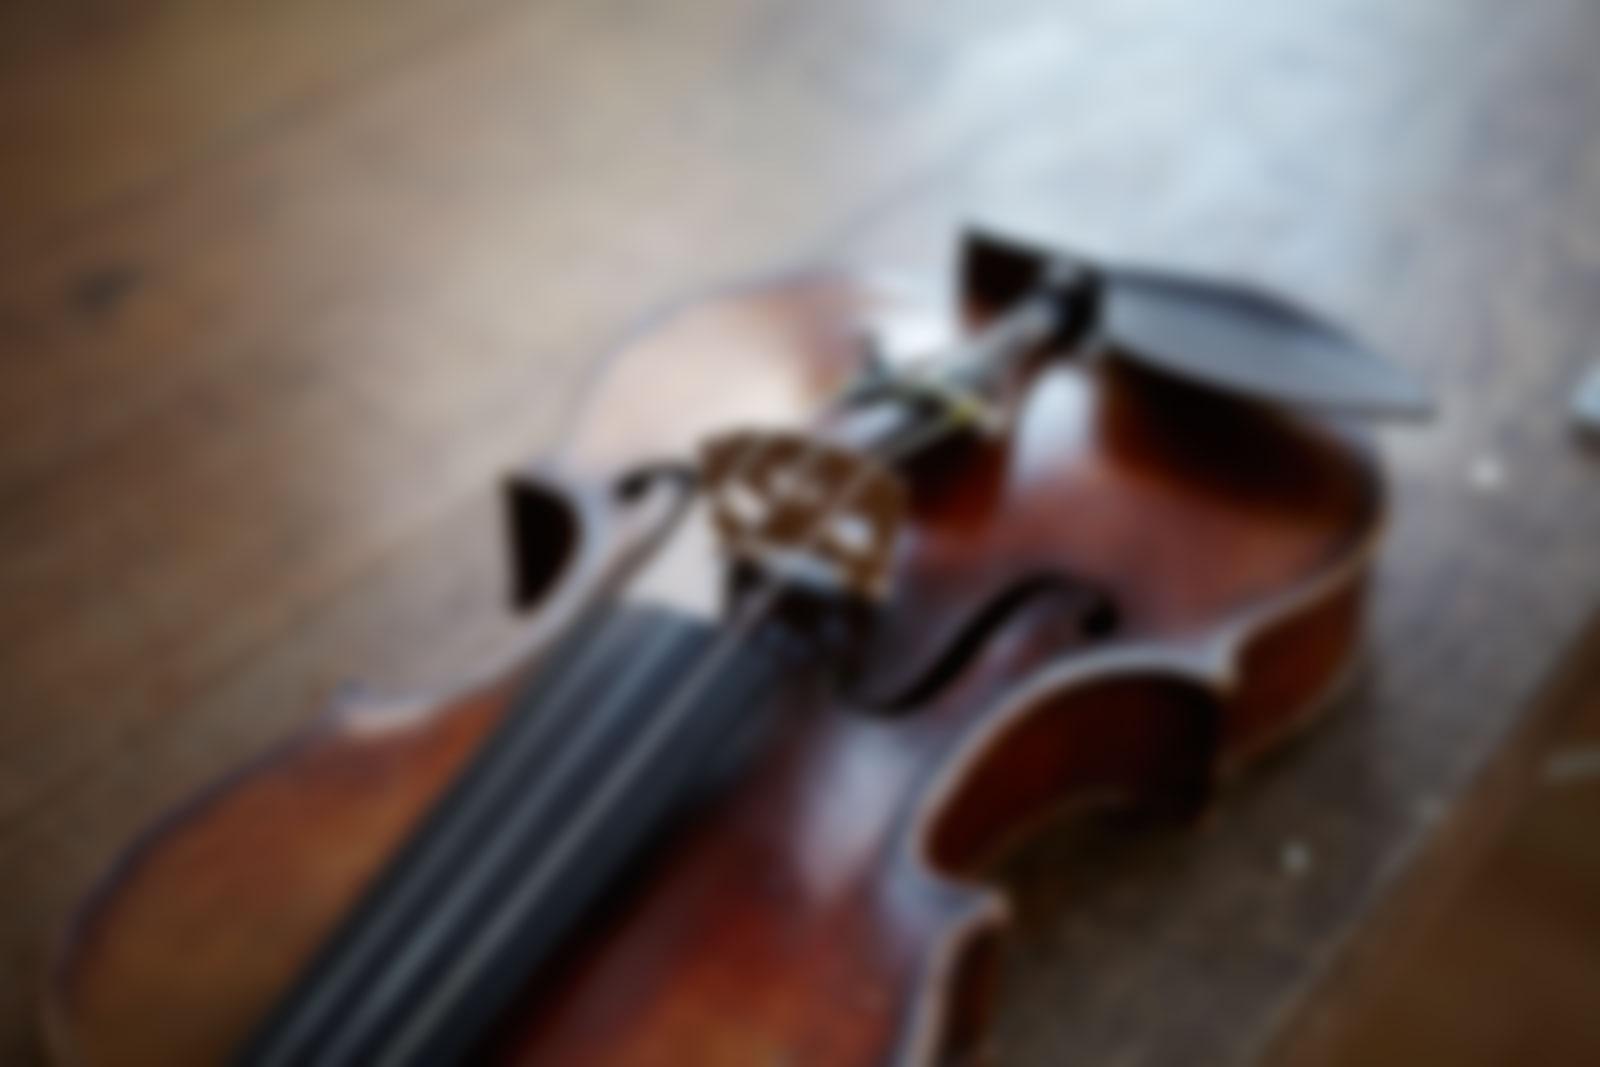 Old wood minerale interior of violin - Old Wood Minerale Interior Of Violin 49